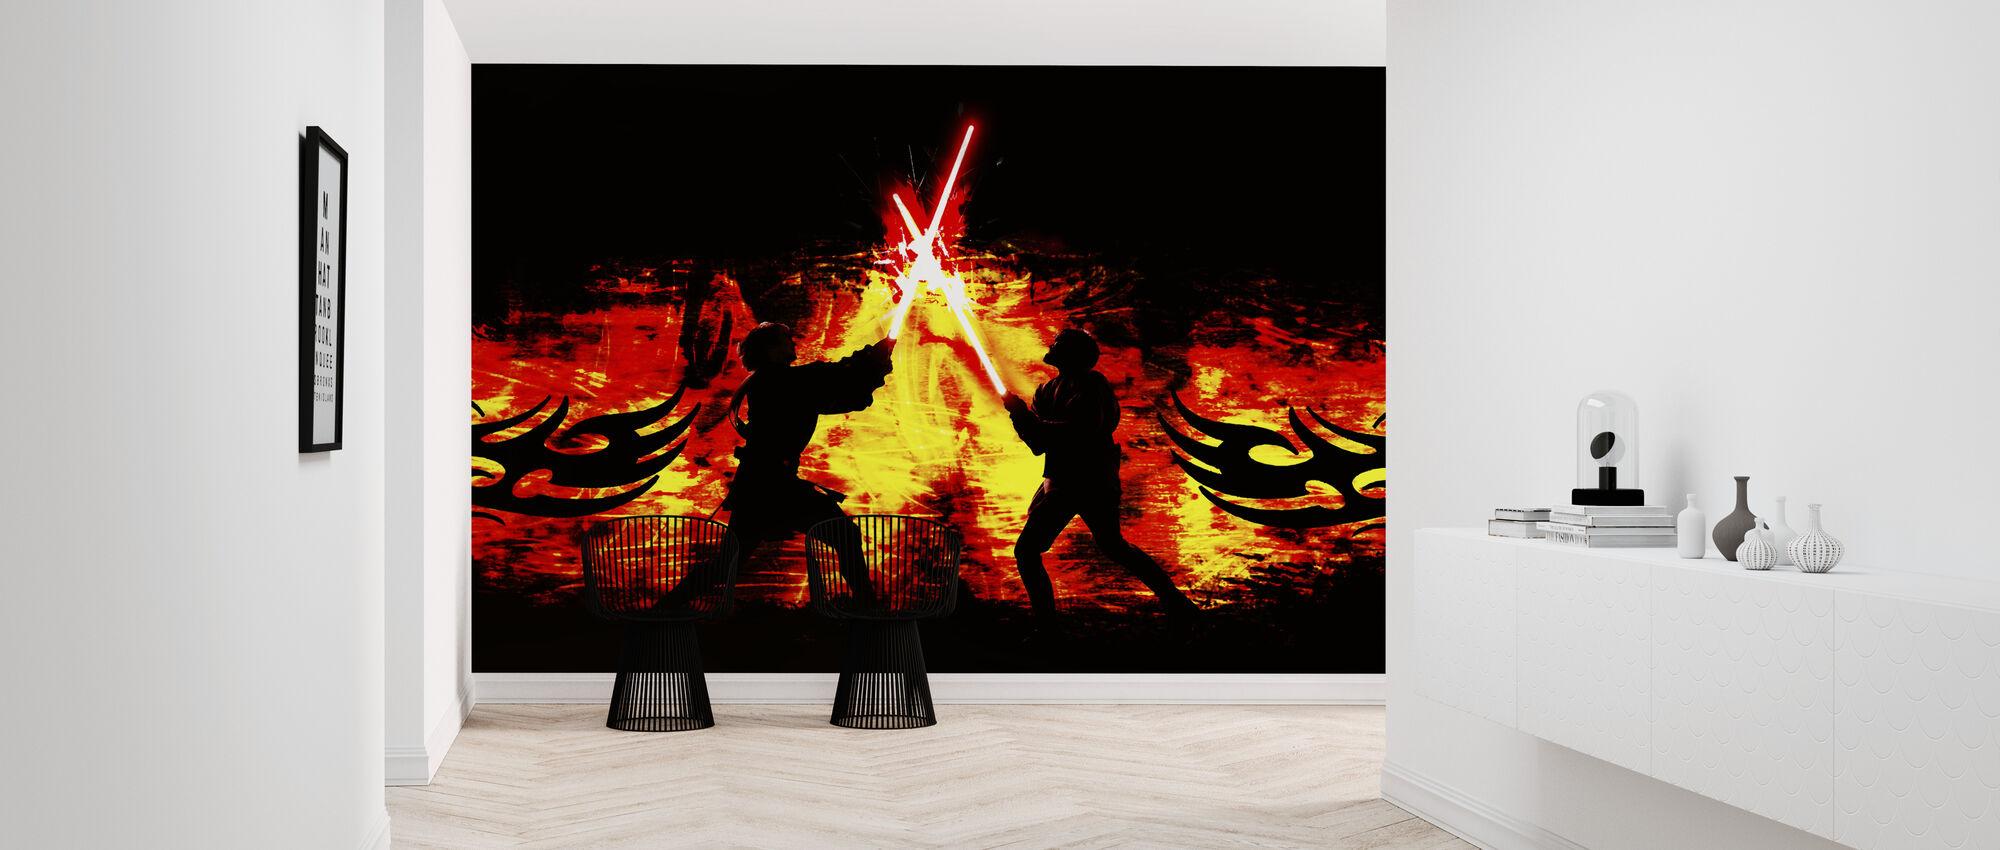 Star Wars - lyssaber kamp flammer - Tapet - Gang